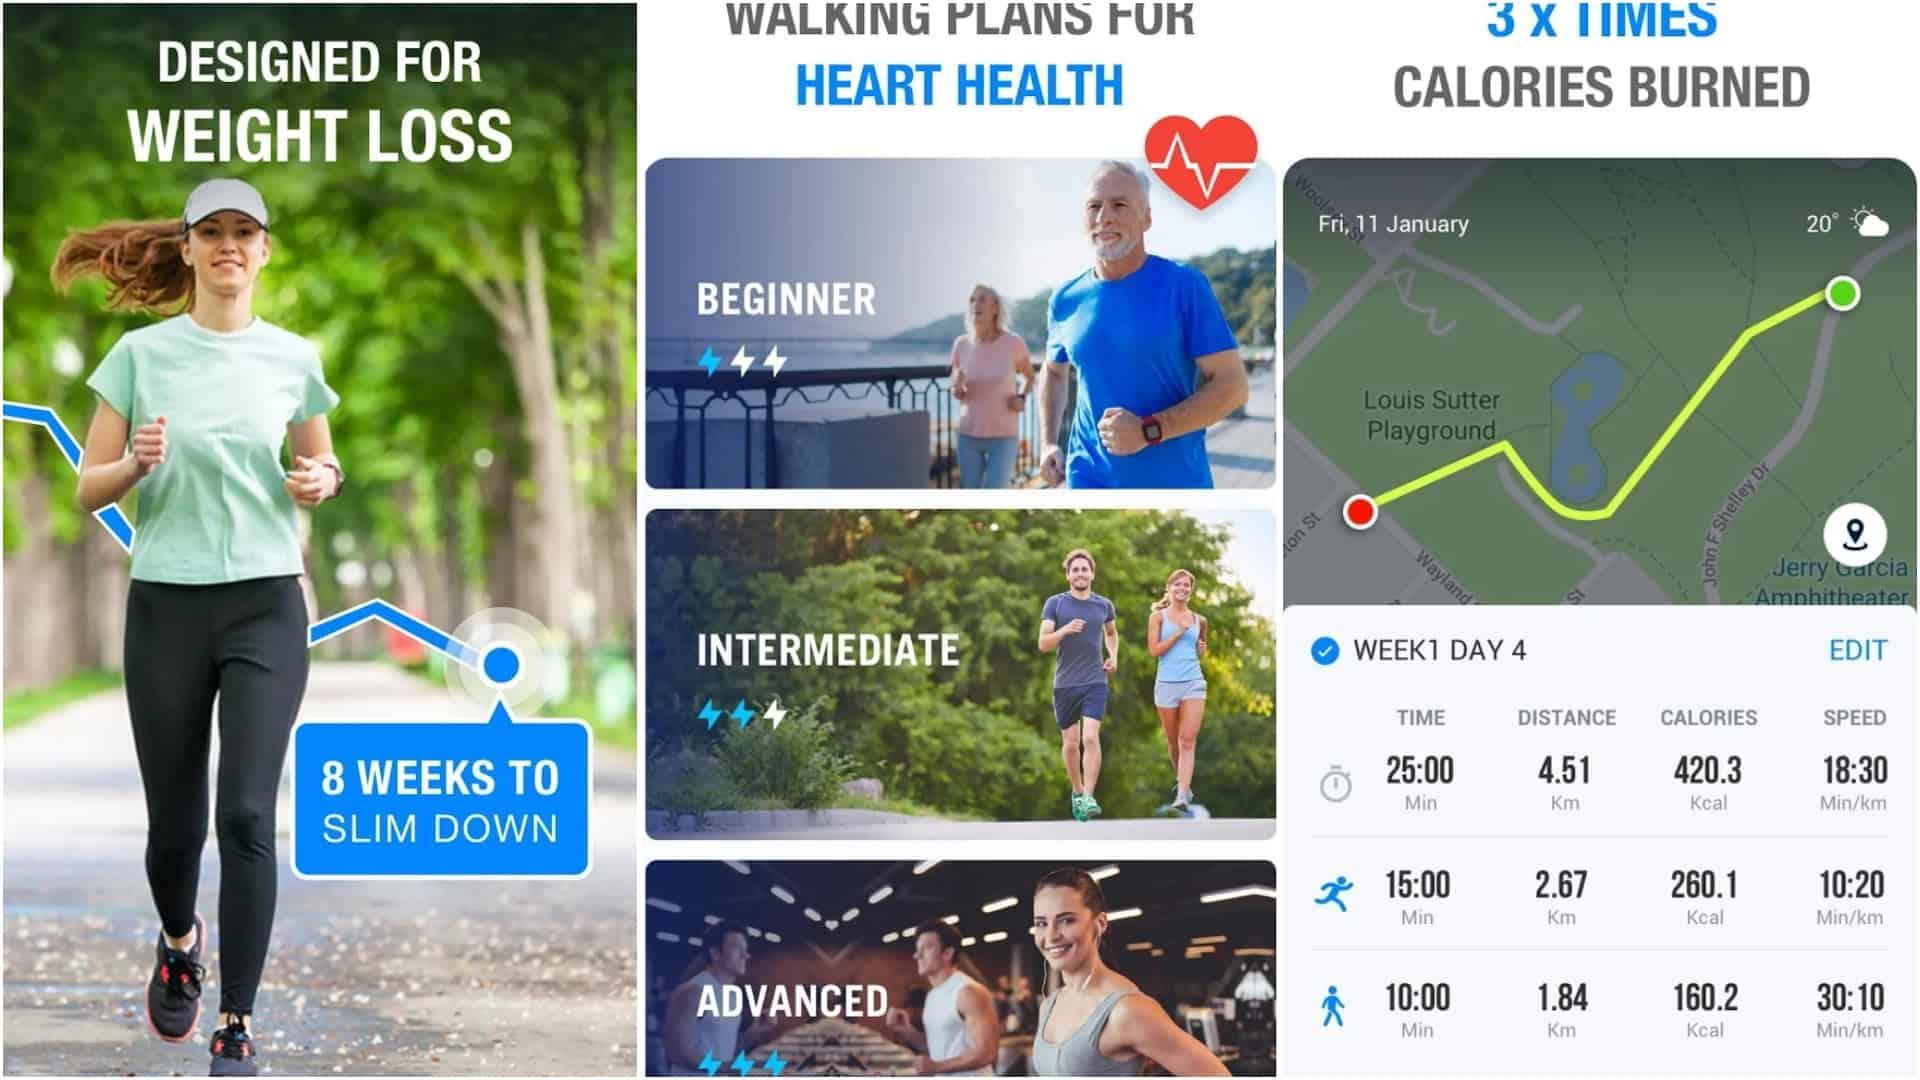 Walking App – Walking for Weight Loss app image April 2020